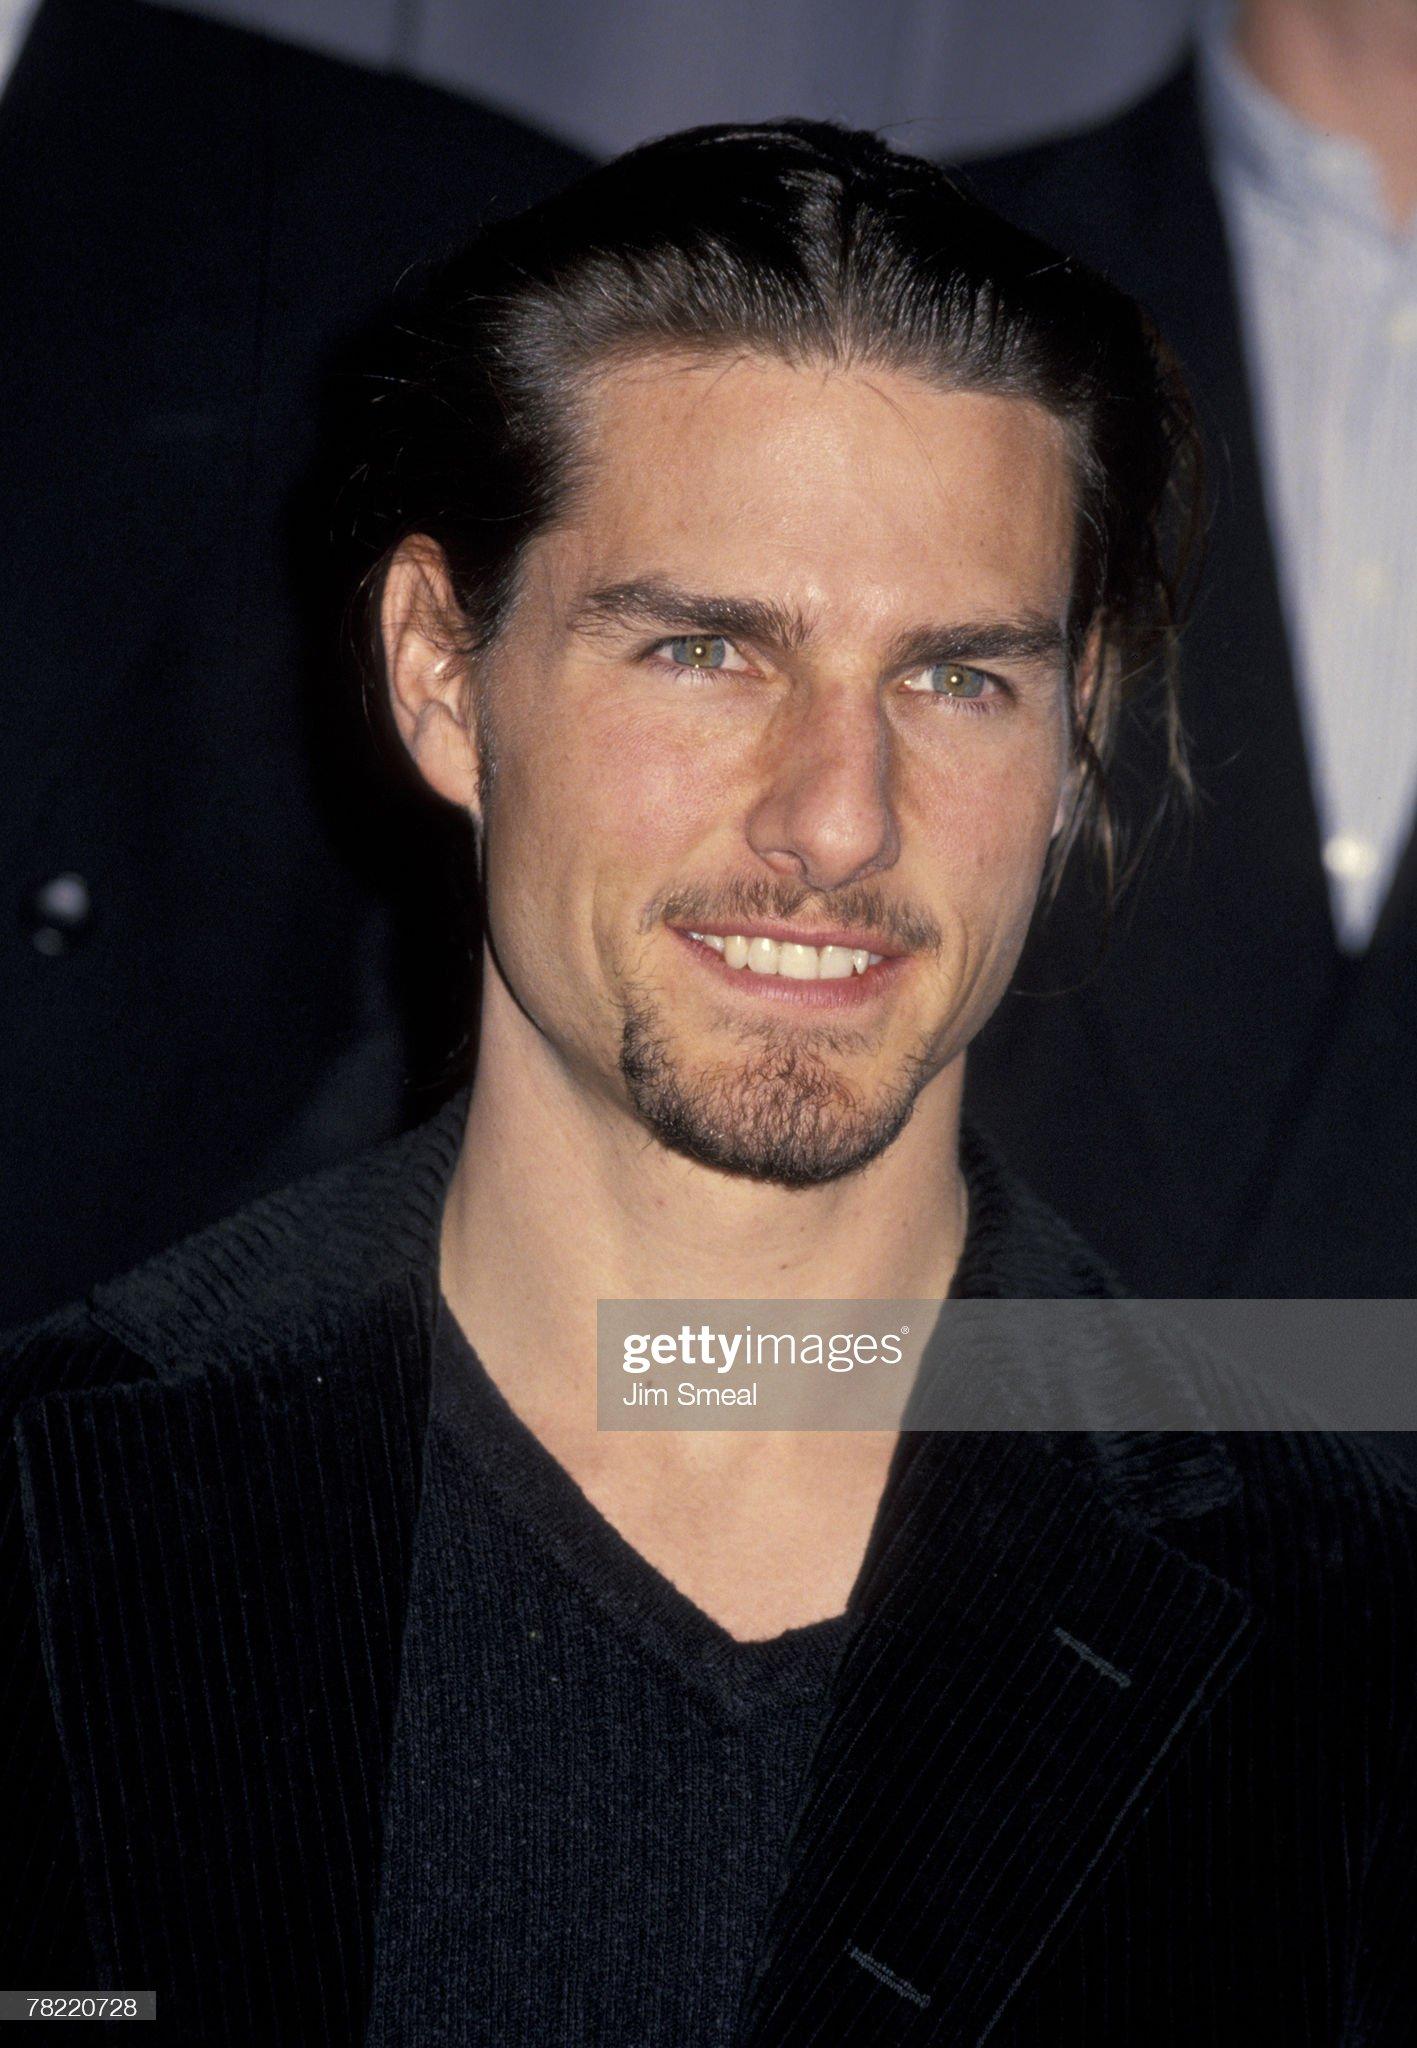 Tom Cruise (Galería de fotos) Tom-cruise-picture-id78220728?s=2048x2048